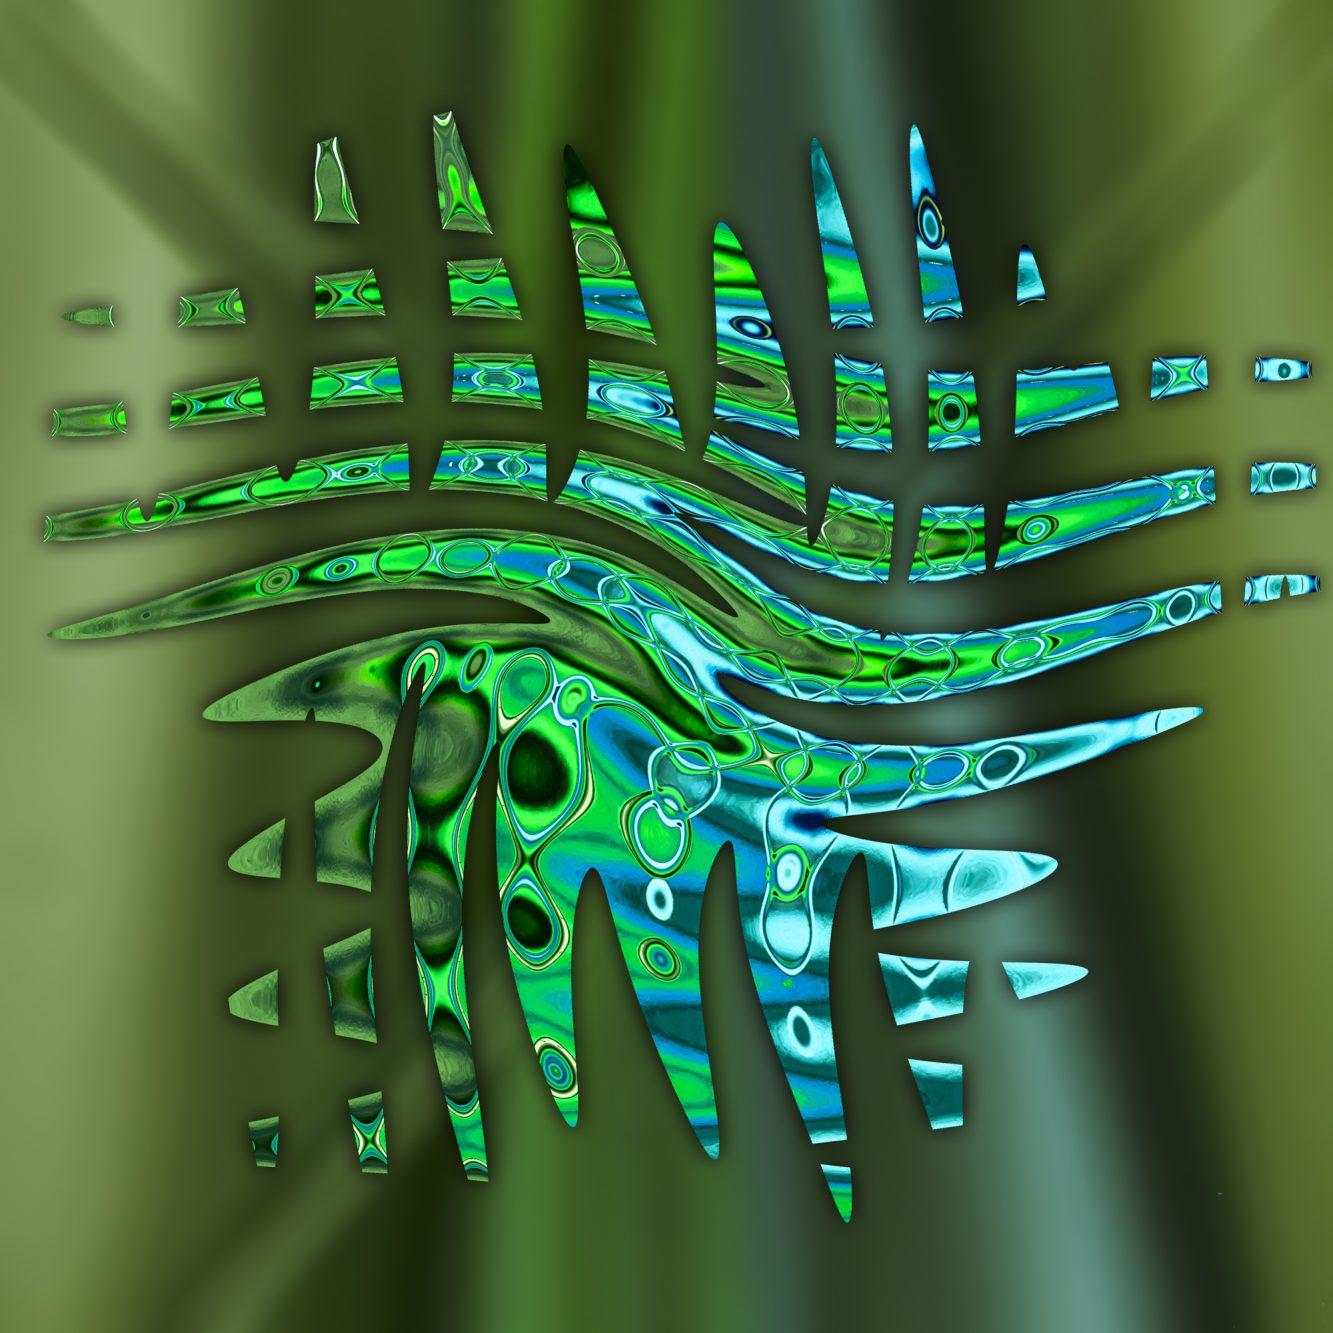 glass-photo-art-5680-bewerkt